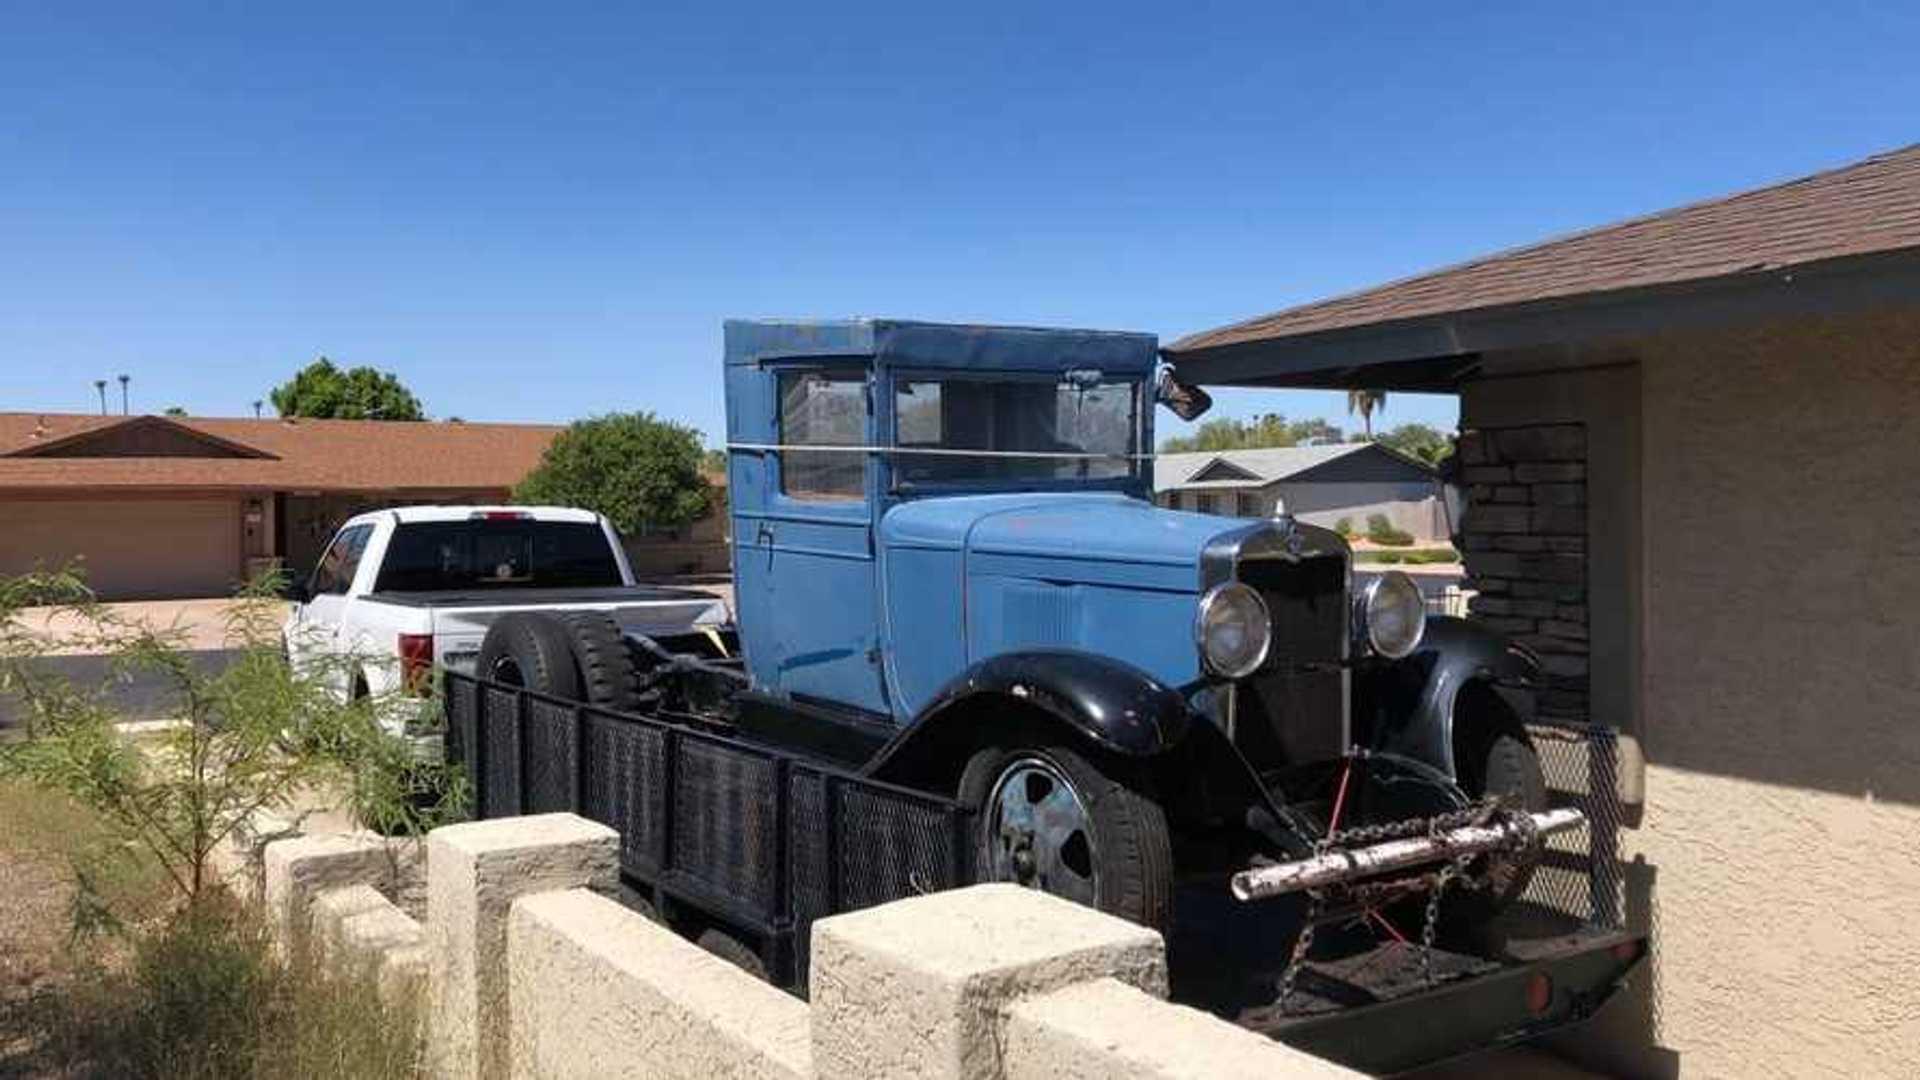 Craigslist Find 1931 Chevy 1 5 Ton Truck With Original Parts